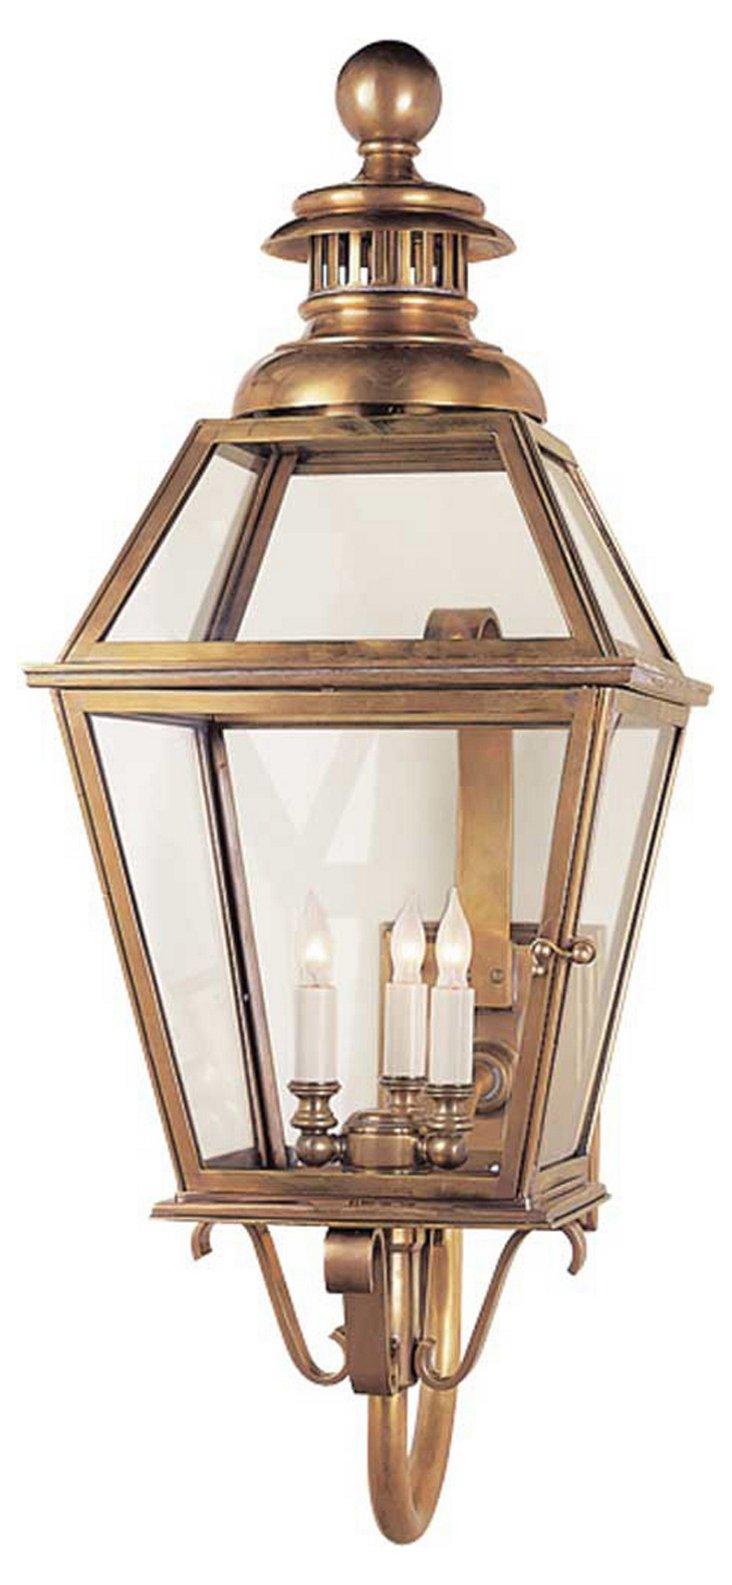 Chelsea 3-Light Wall Lantern, Brass